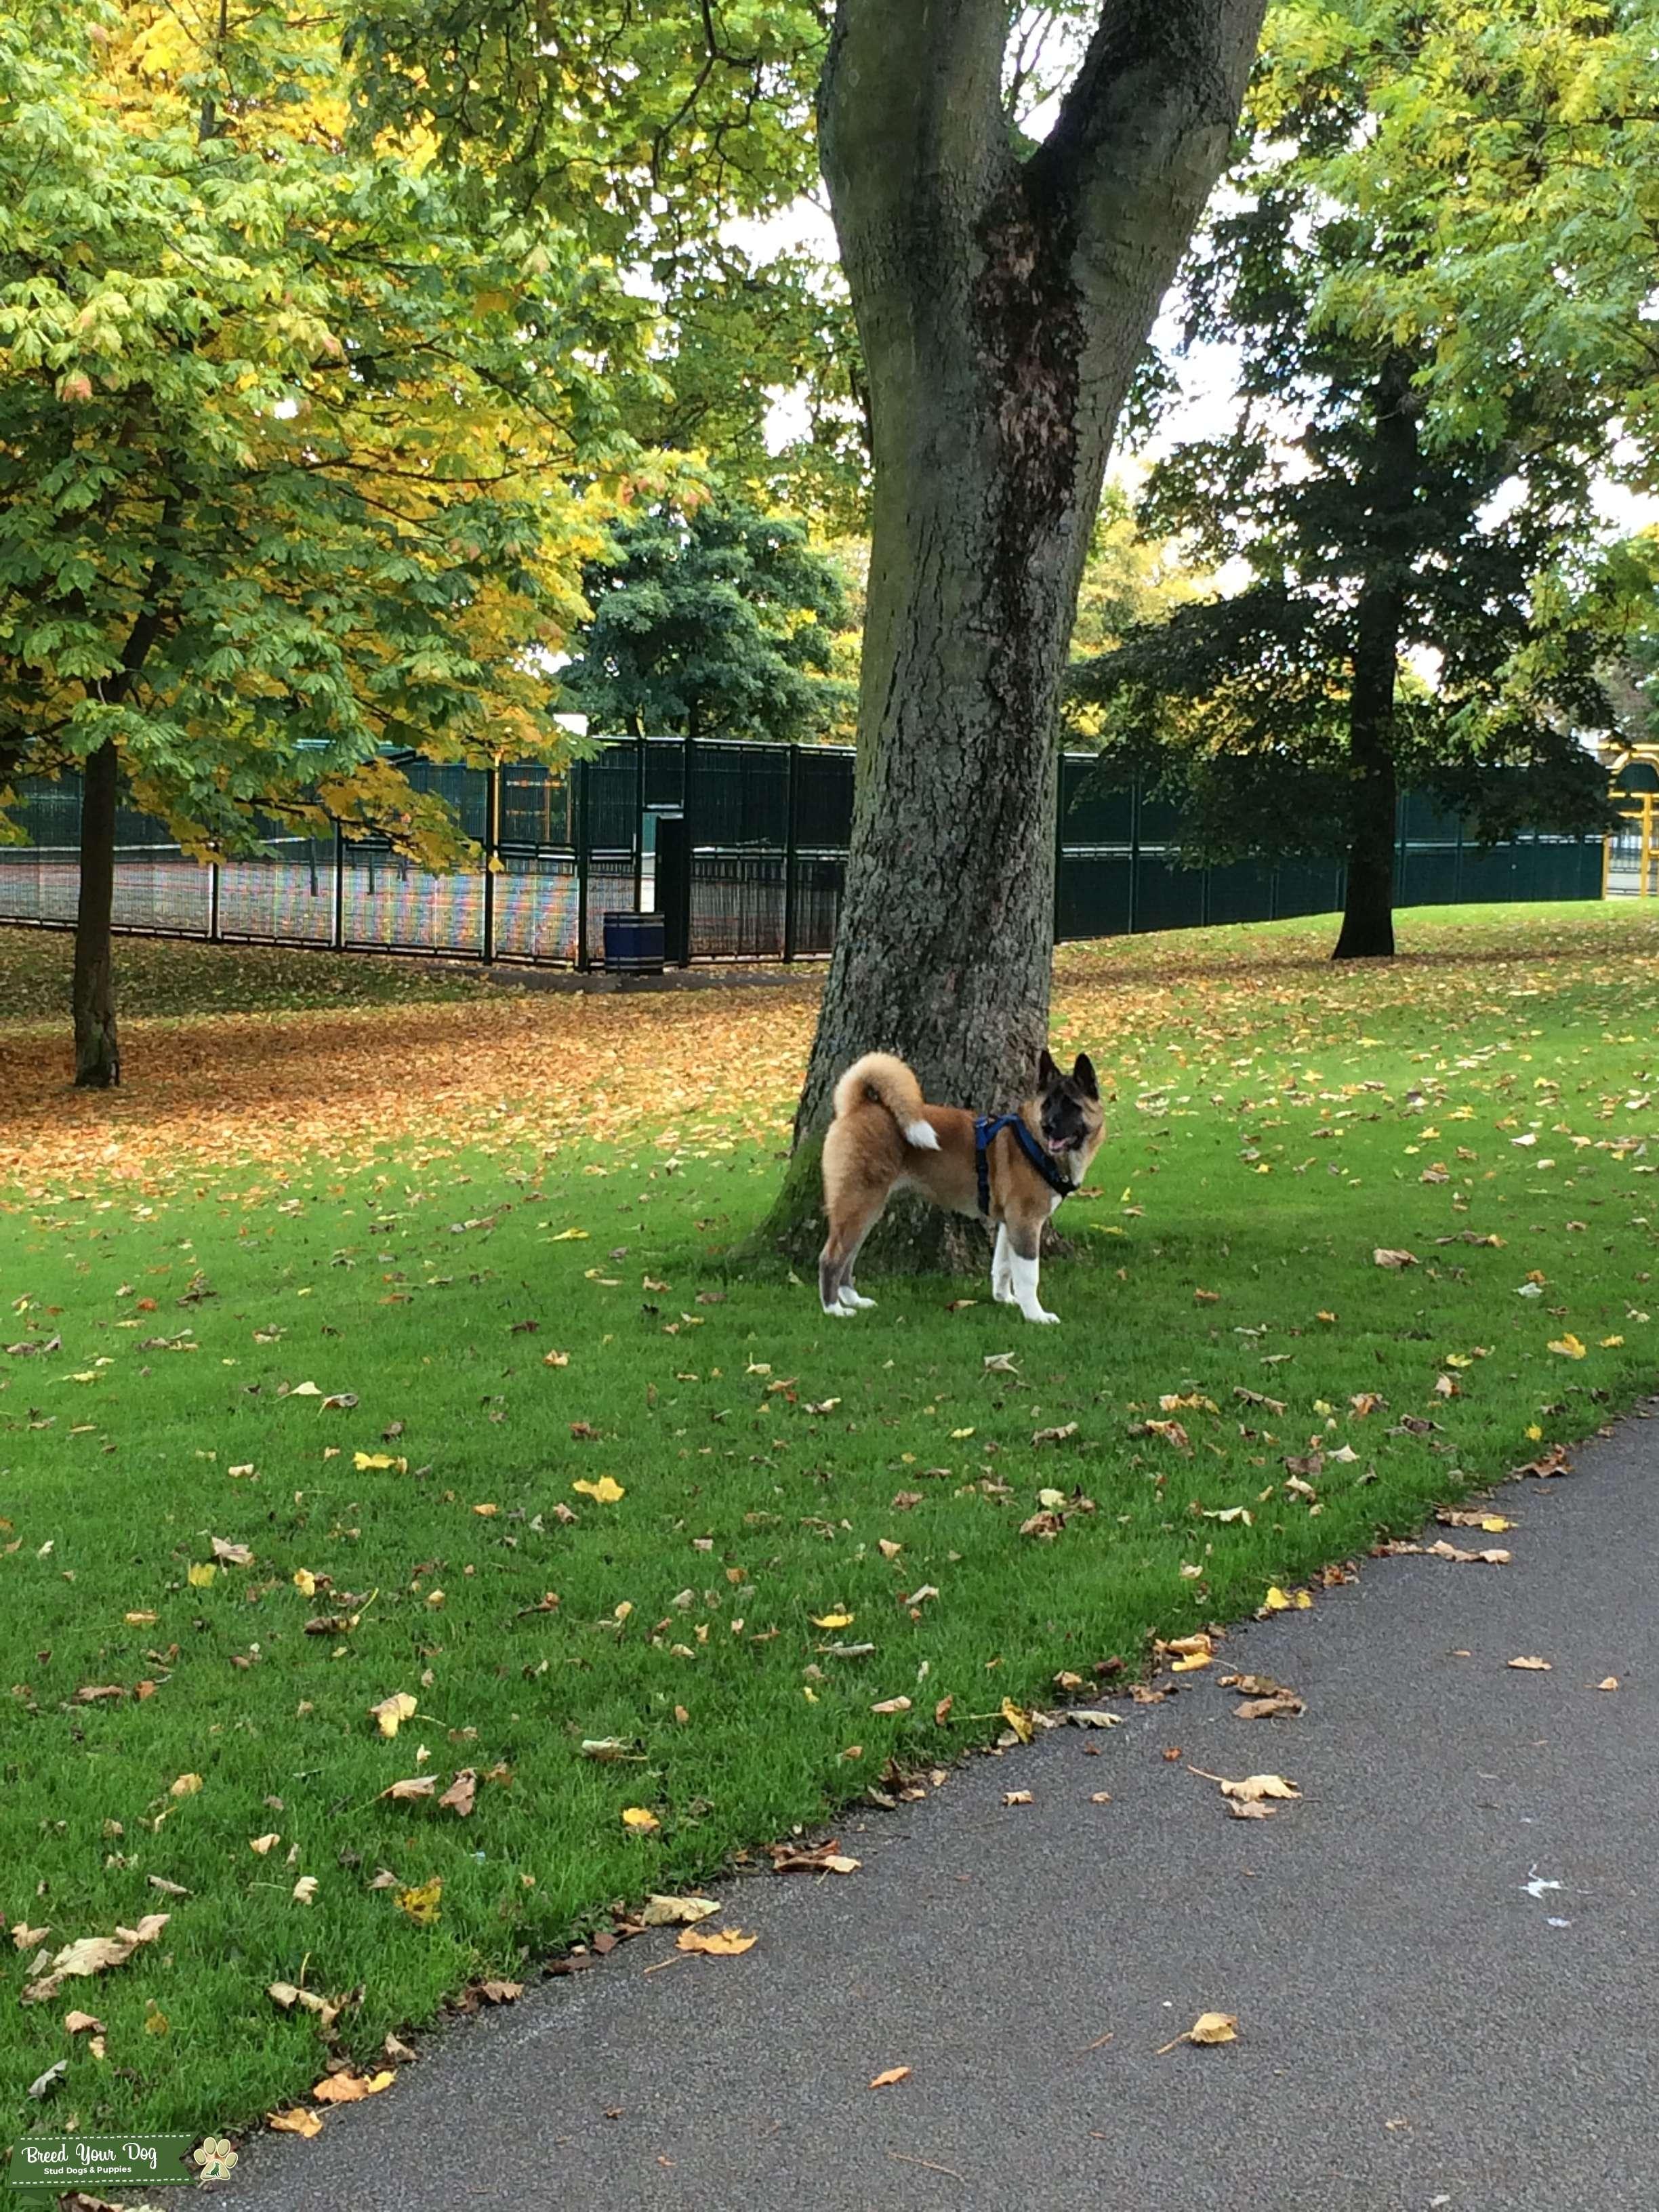 How To Make Your Dog Grow Big And Strong